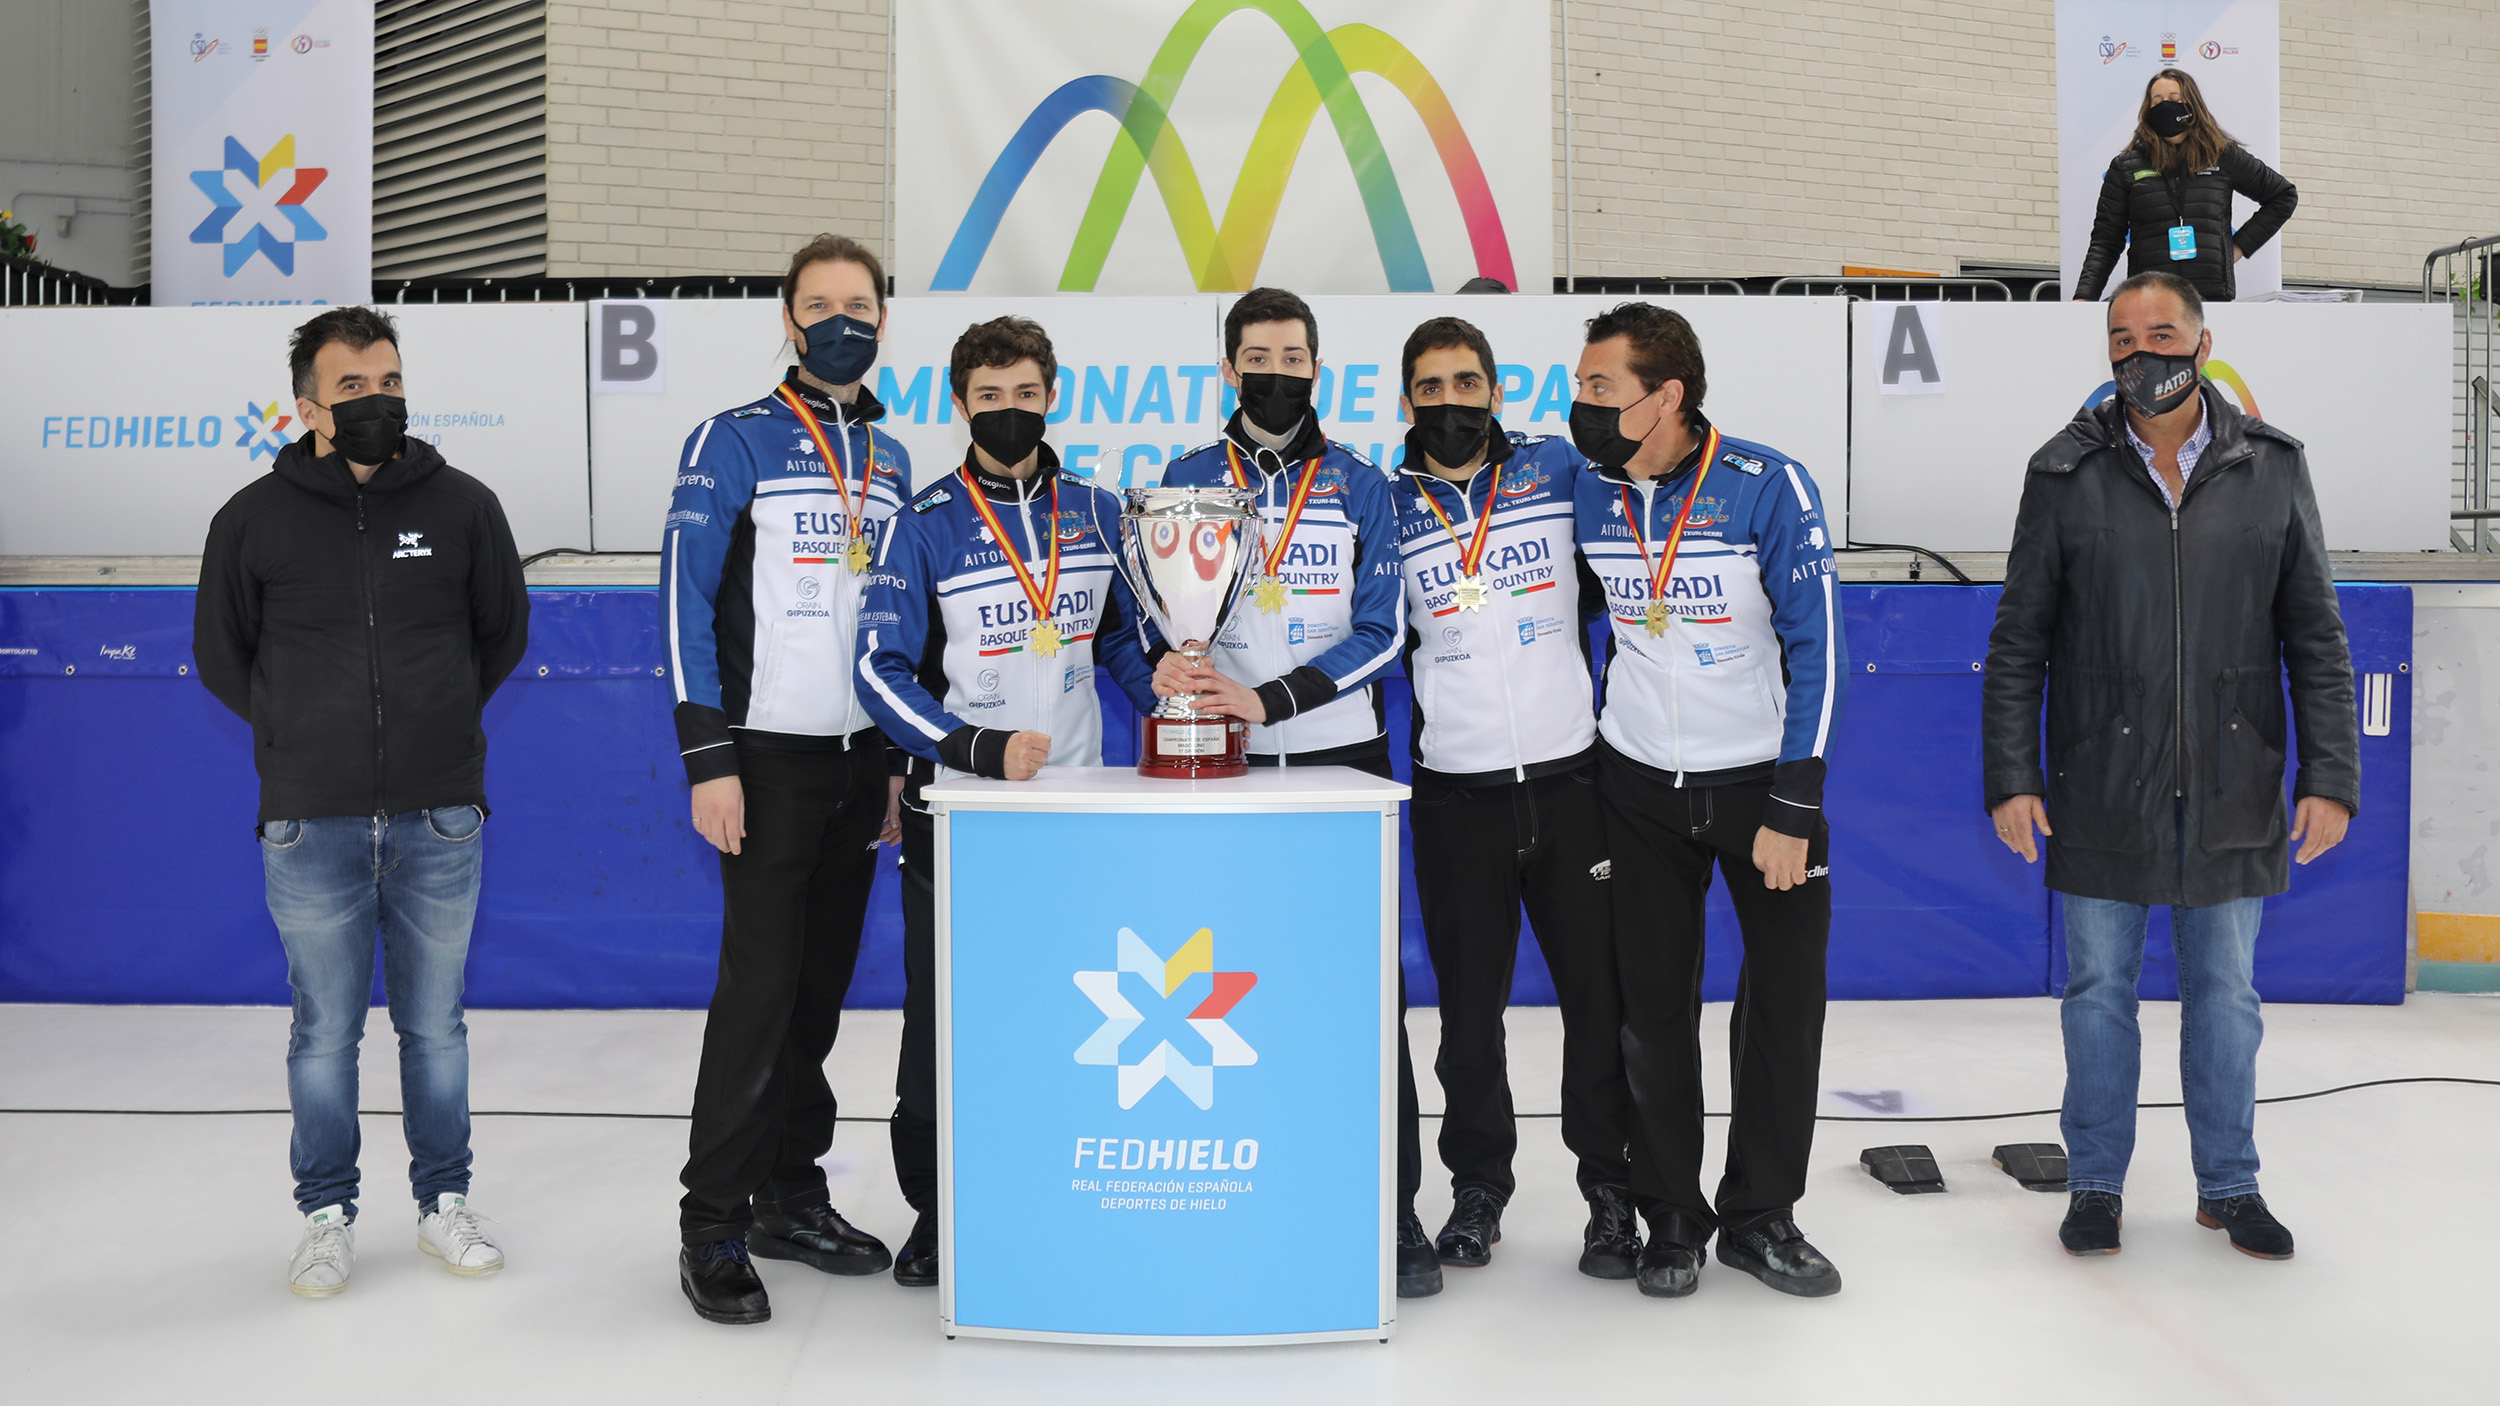 Txuri-Berri, Txuri-Berri Curling logra su séptima corona nacional masculina, Real Federación Española Deportes de Hielo